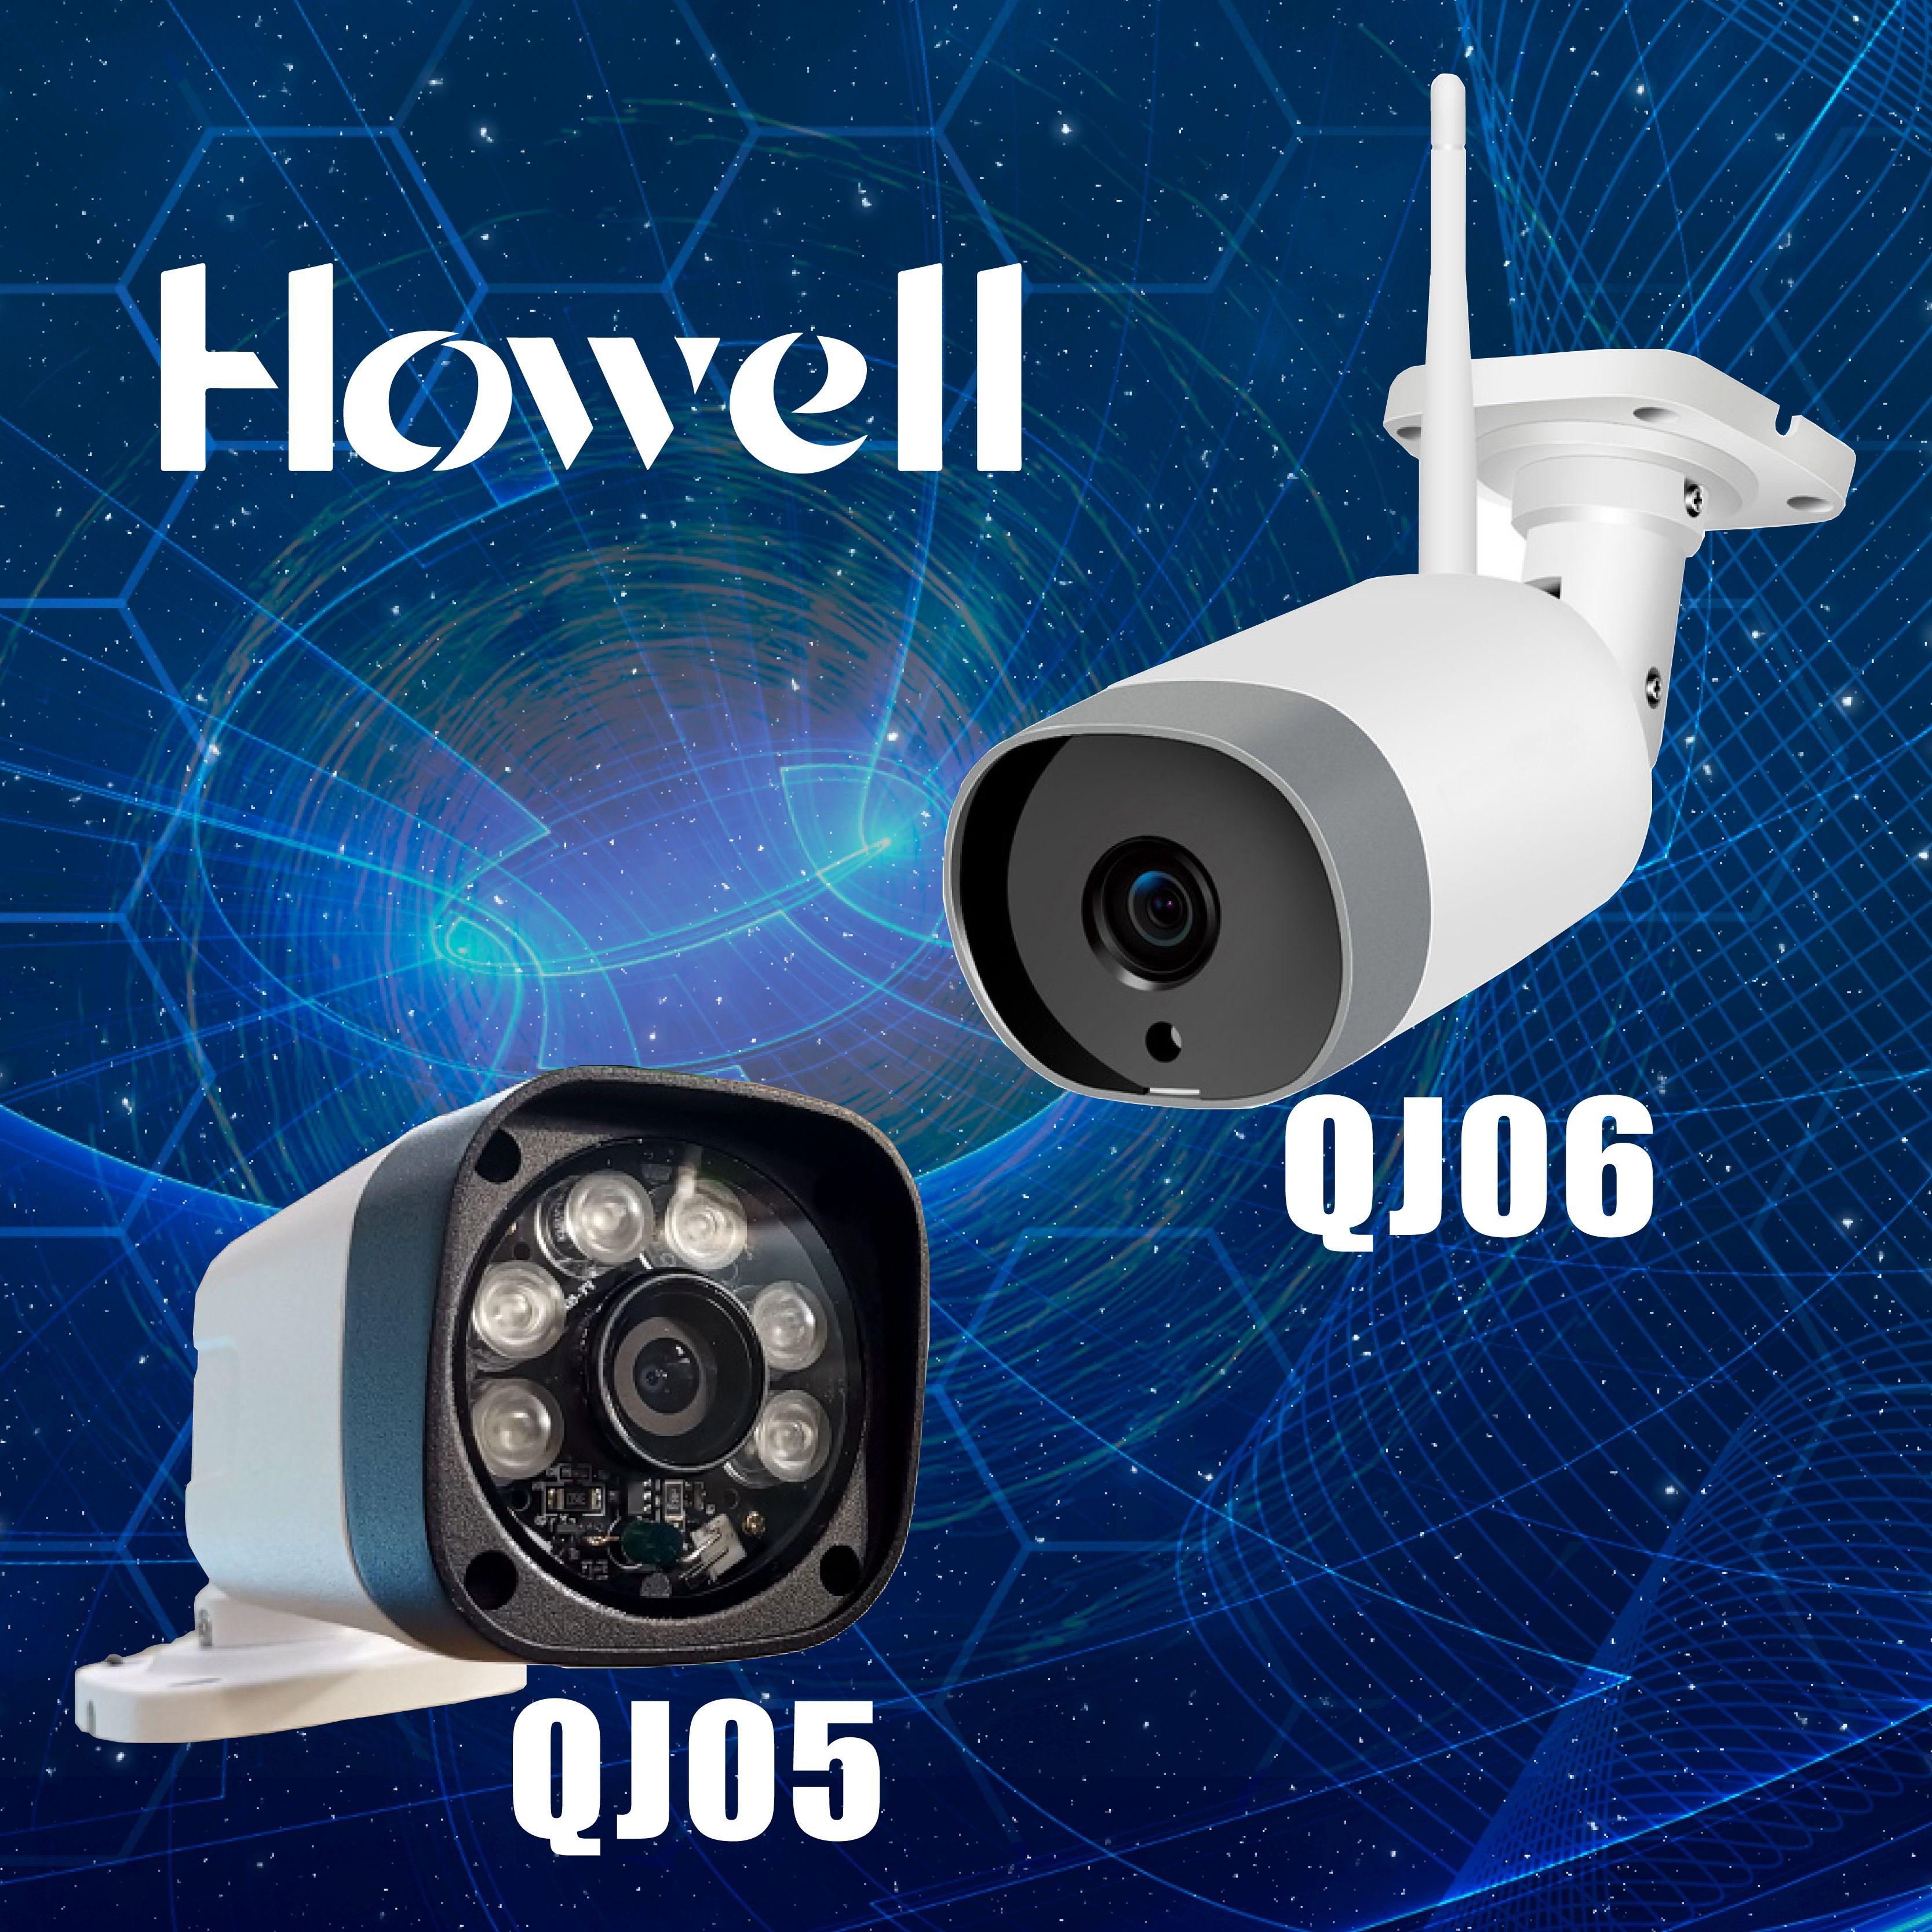 HowellCam QJ05&06 720P/1080P Onvif RTSP Protocol Networ